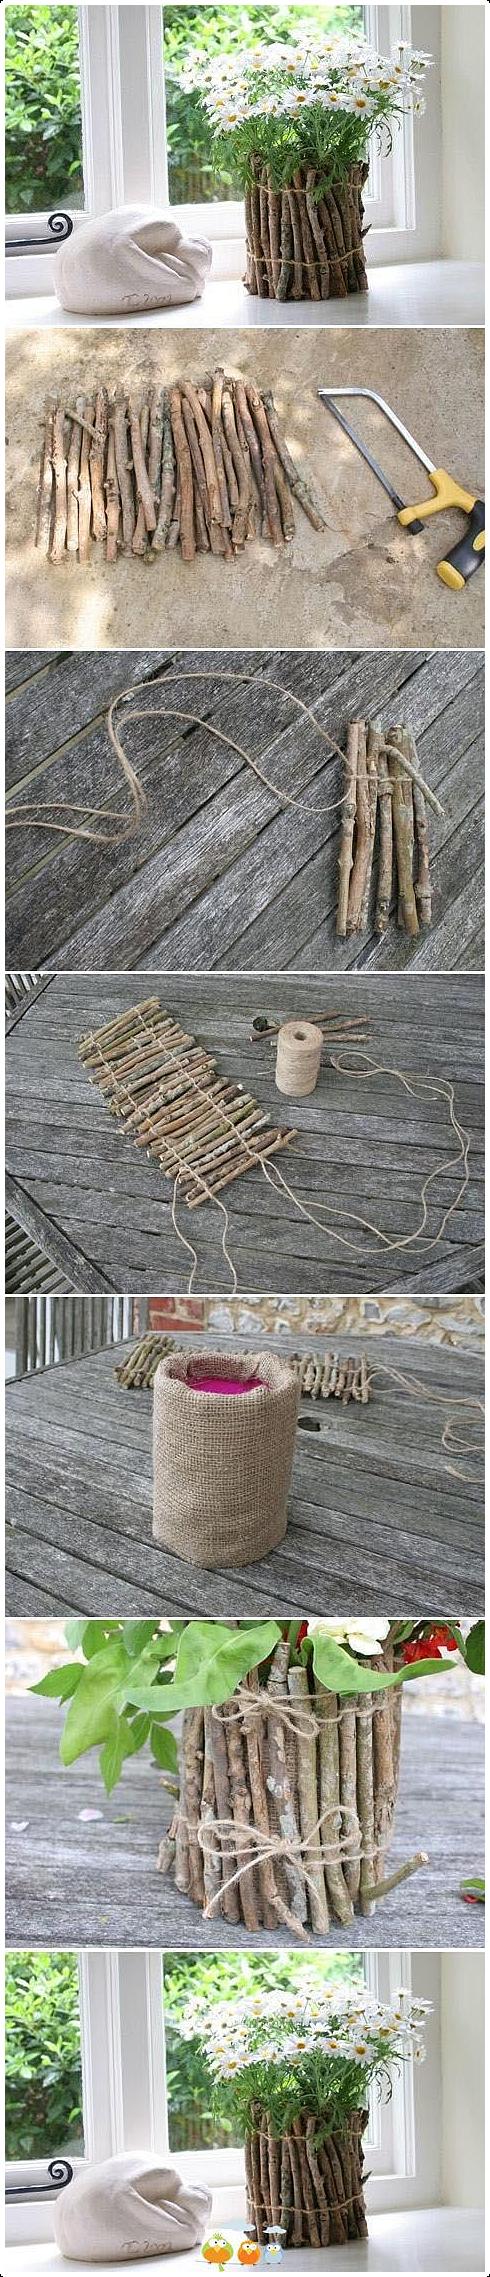 2. Attractive DIY Twig Flower Pot via SIMPHOME.COM